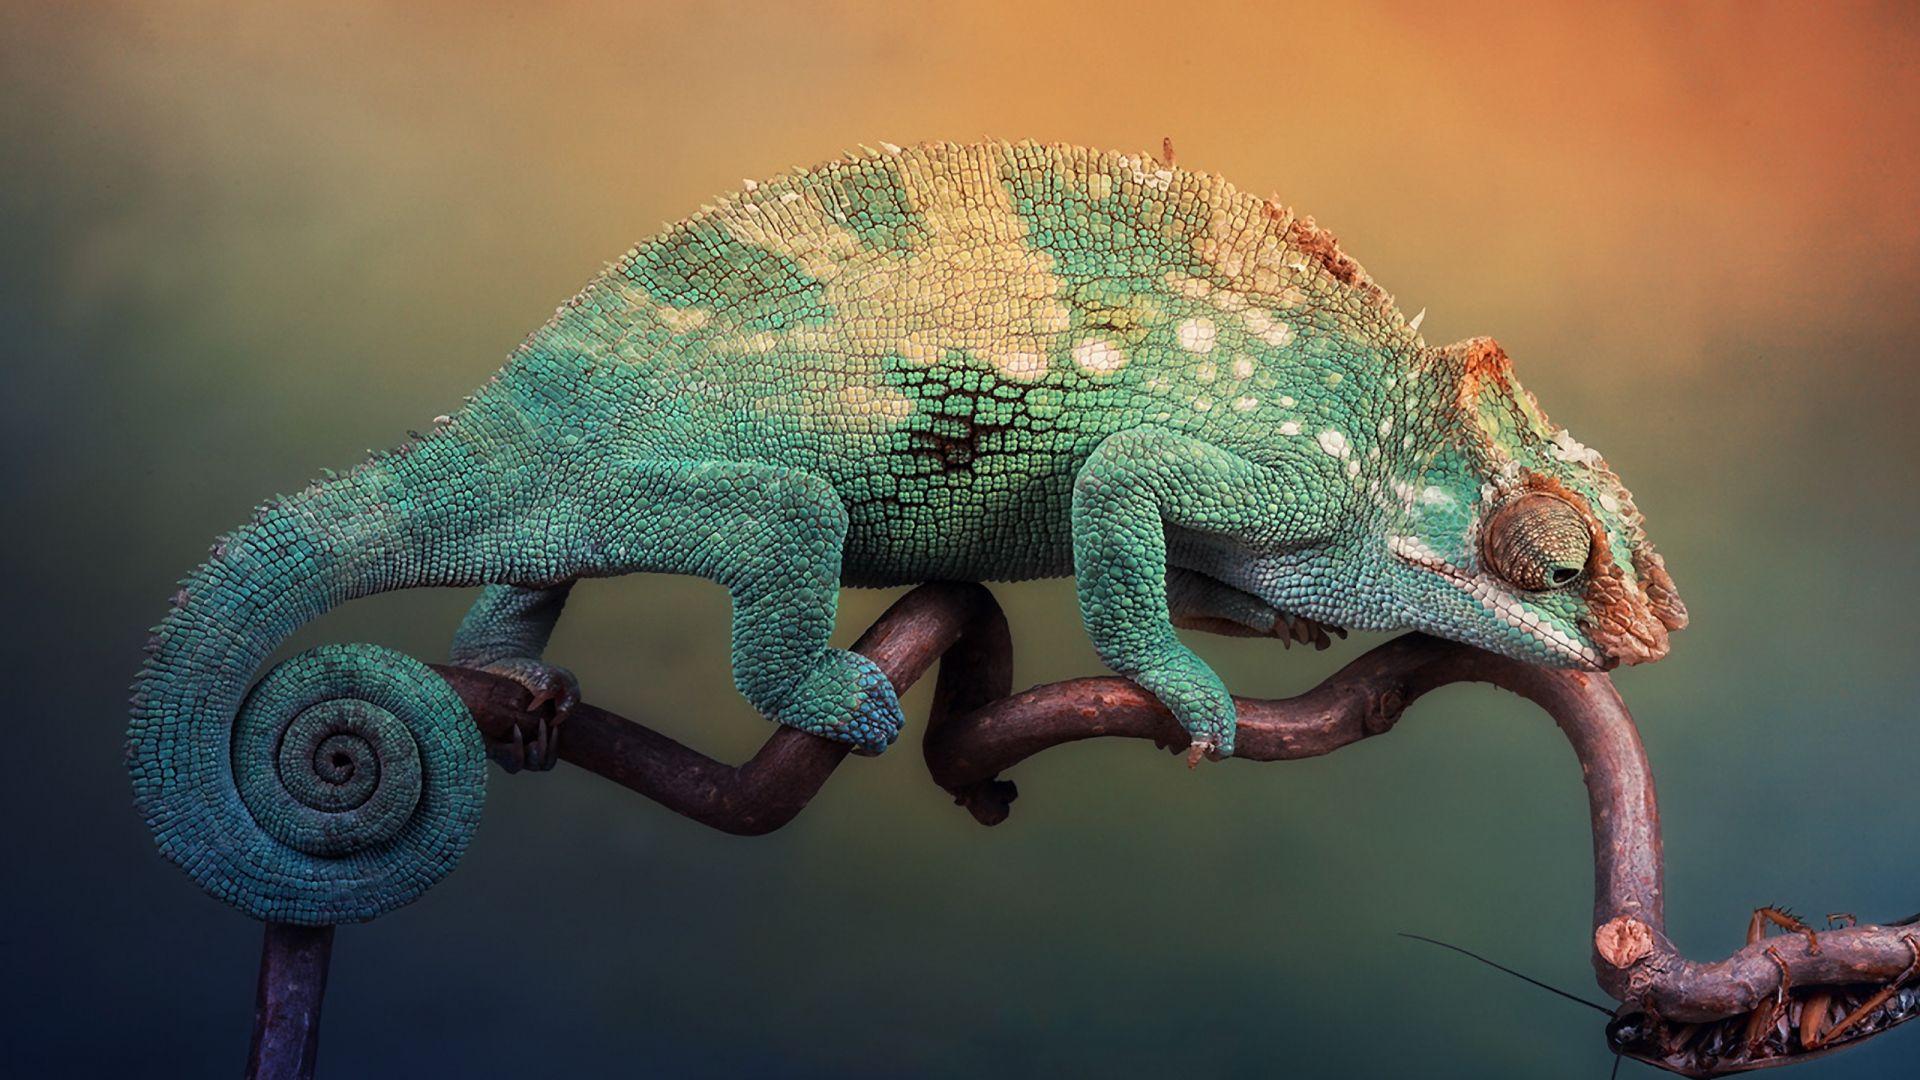 Chameleon Pictures